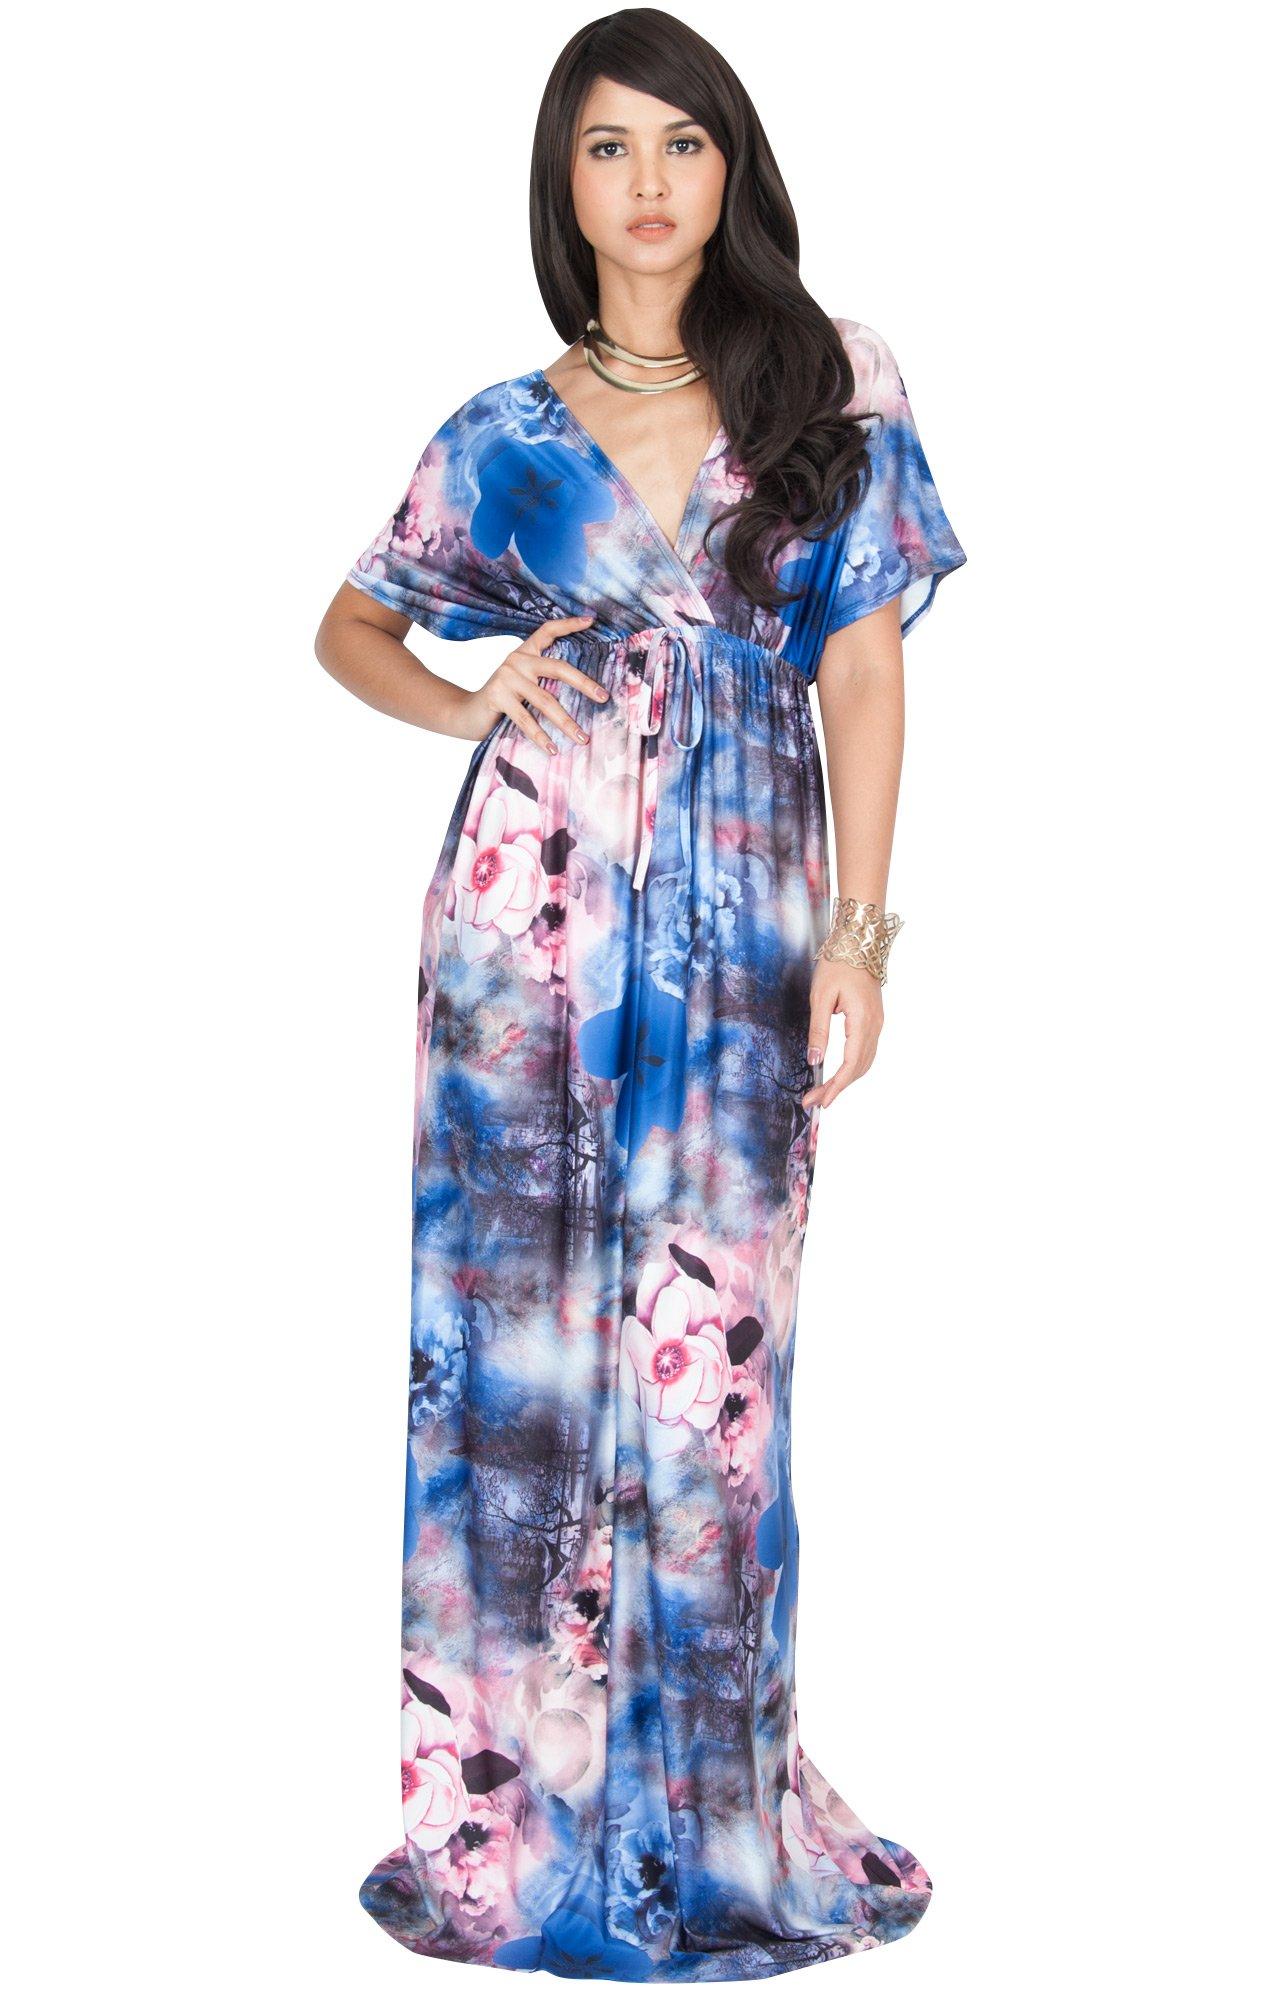 7bb568472de1 KOH KOH Plus Size Womens Long Kimono Short Sleeve V-Neck Floral Print  Spring Summer Flowy Cute Casual Evening Day Sundress Sundresses Sun Gown  Gowns Maxi ...